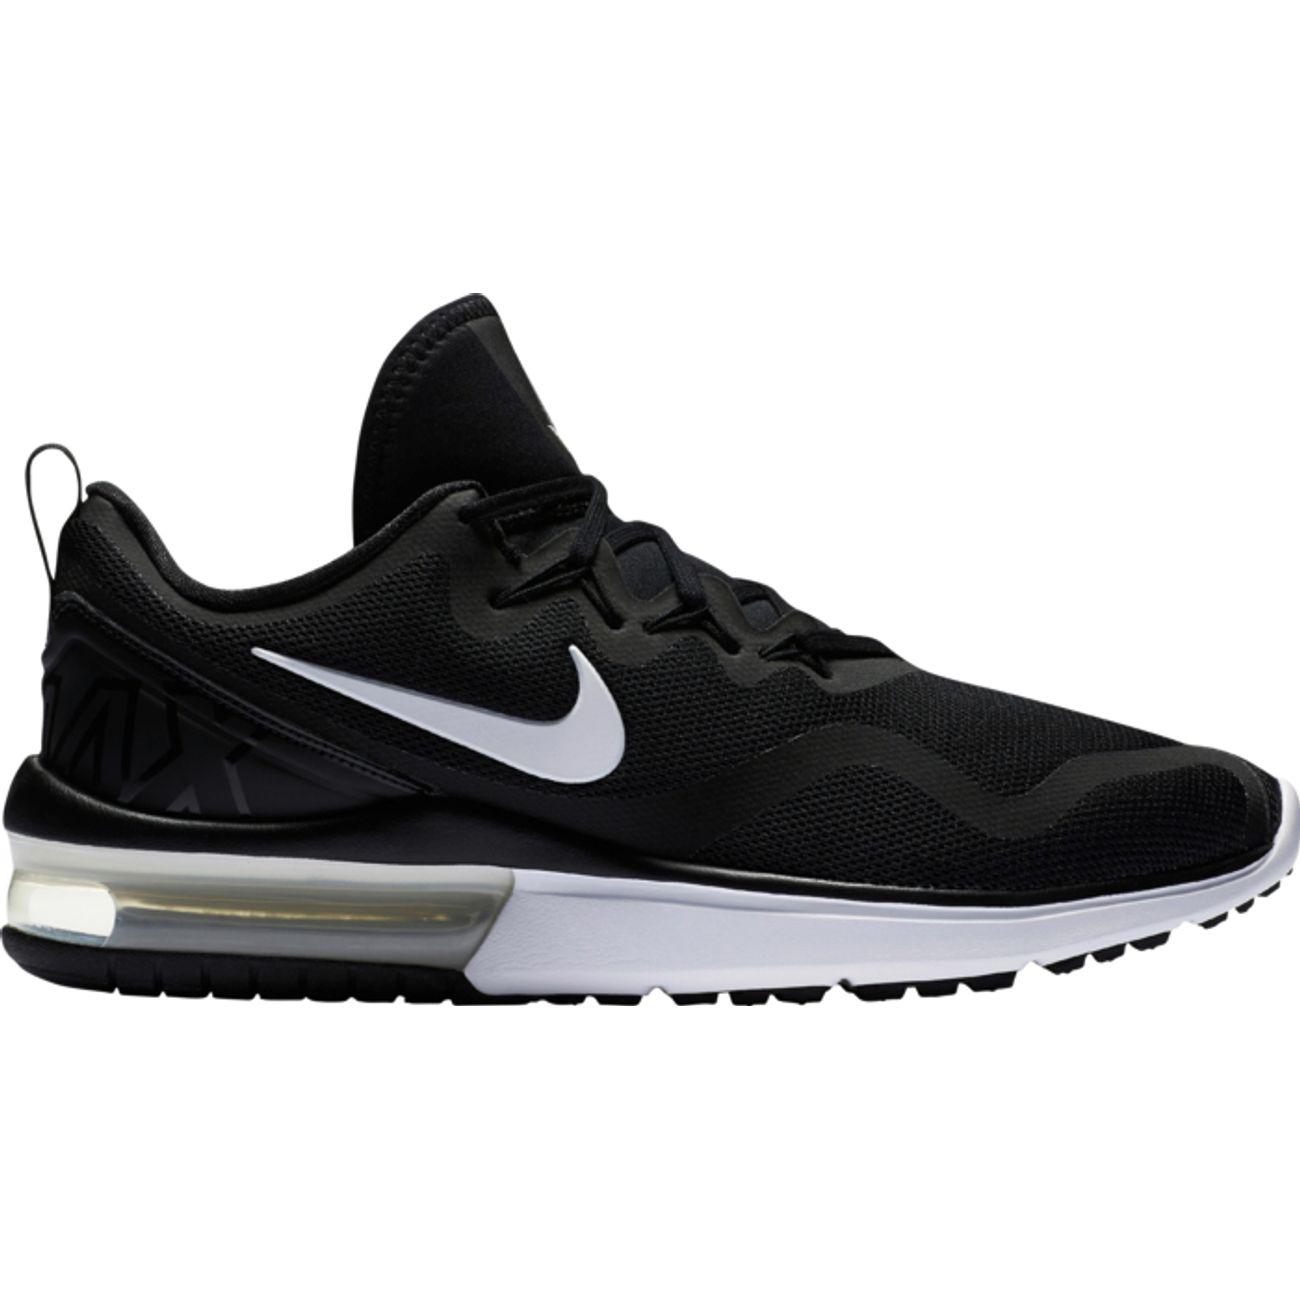 Chaussure de running Nike Air Max Fury pour Homme